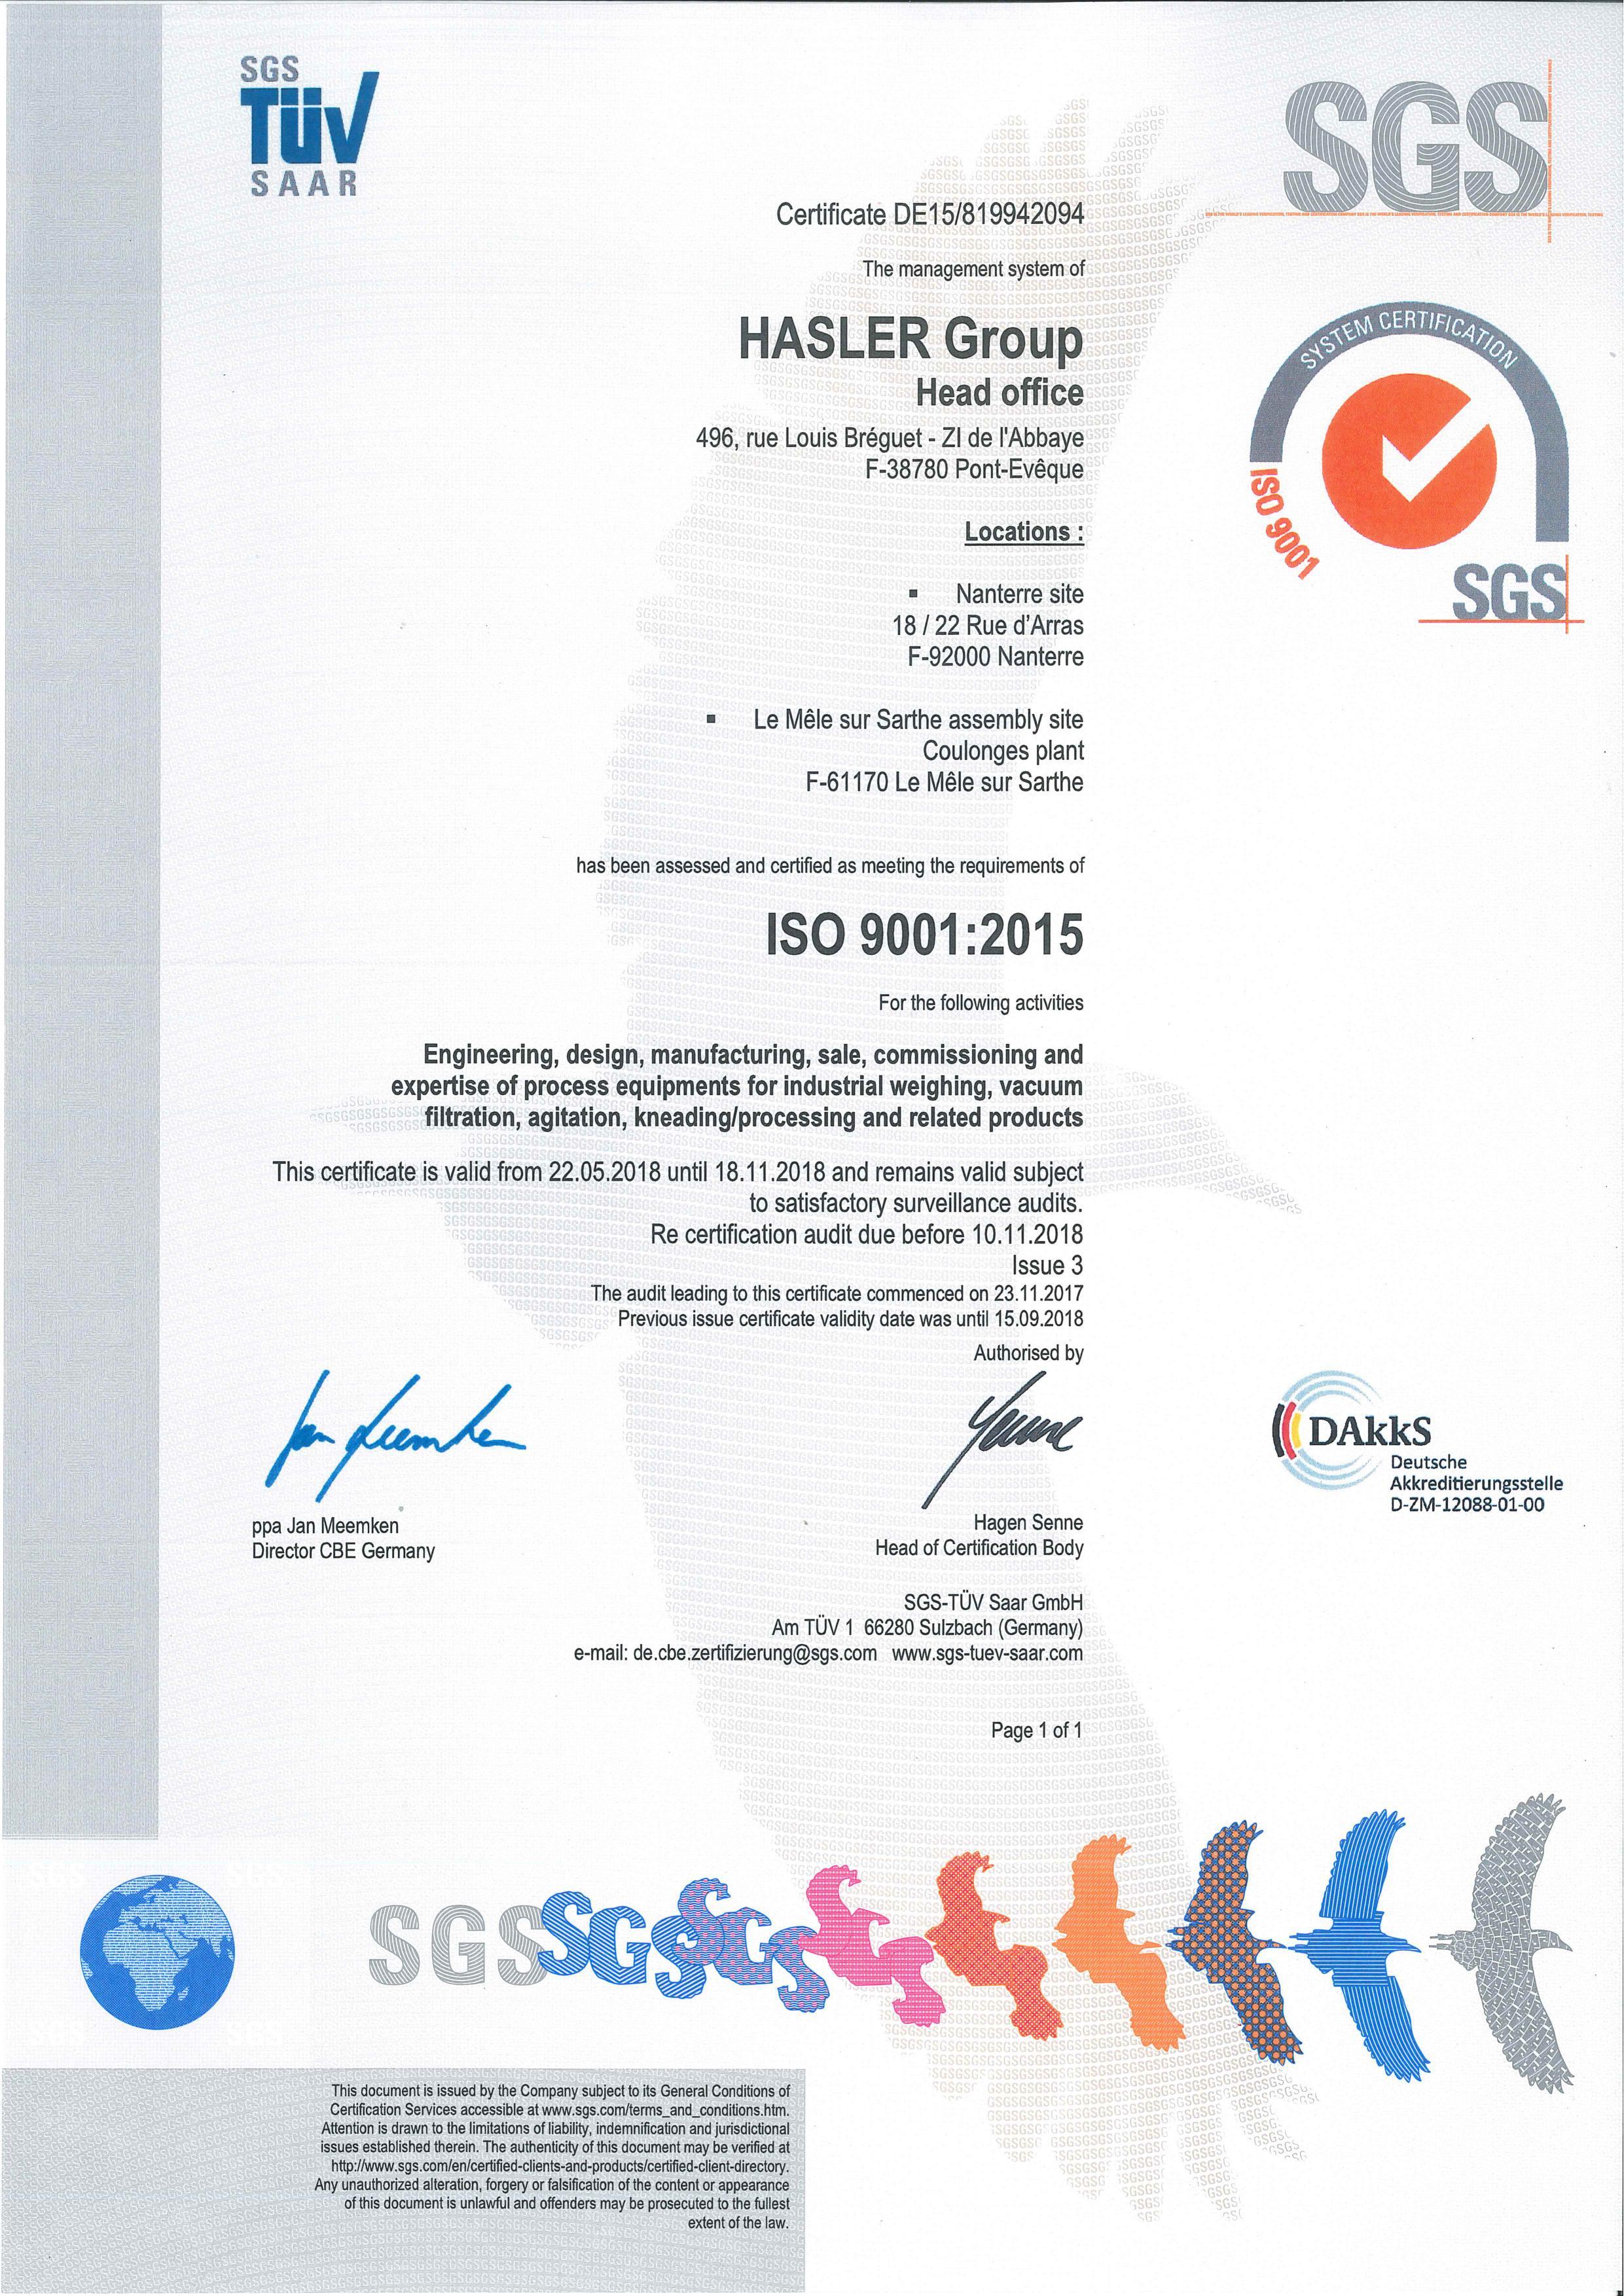 iso 9001 hydac certificate certification english 2008 certificates company certified hasler certificat 2023 technology pdf